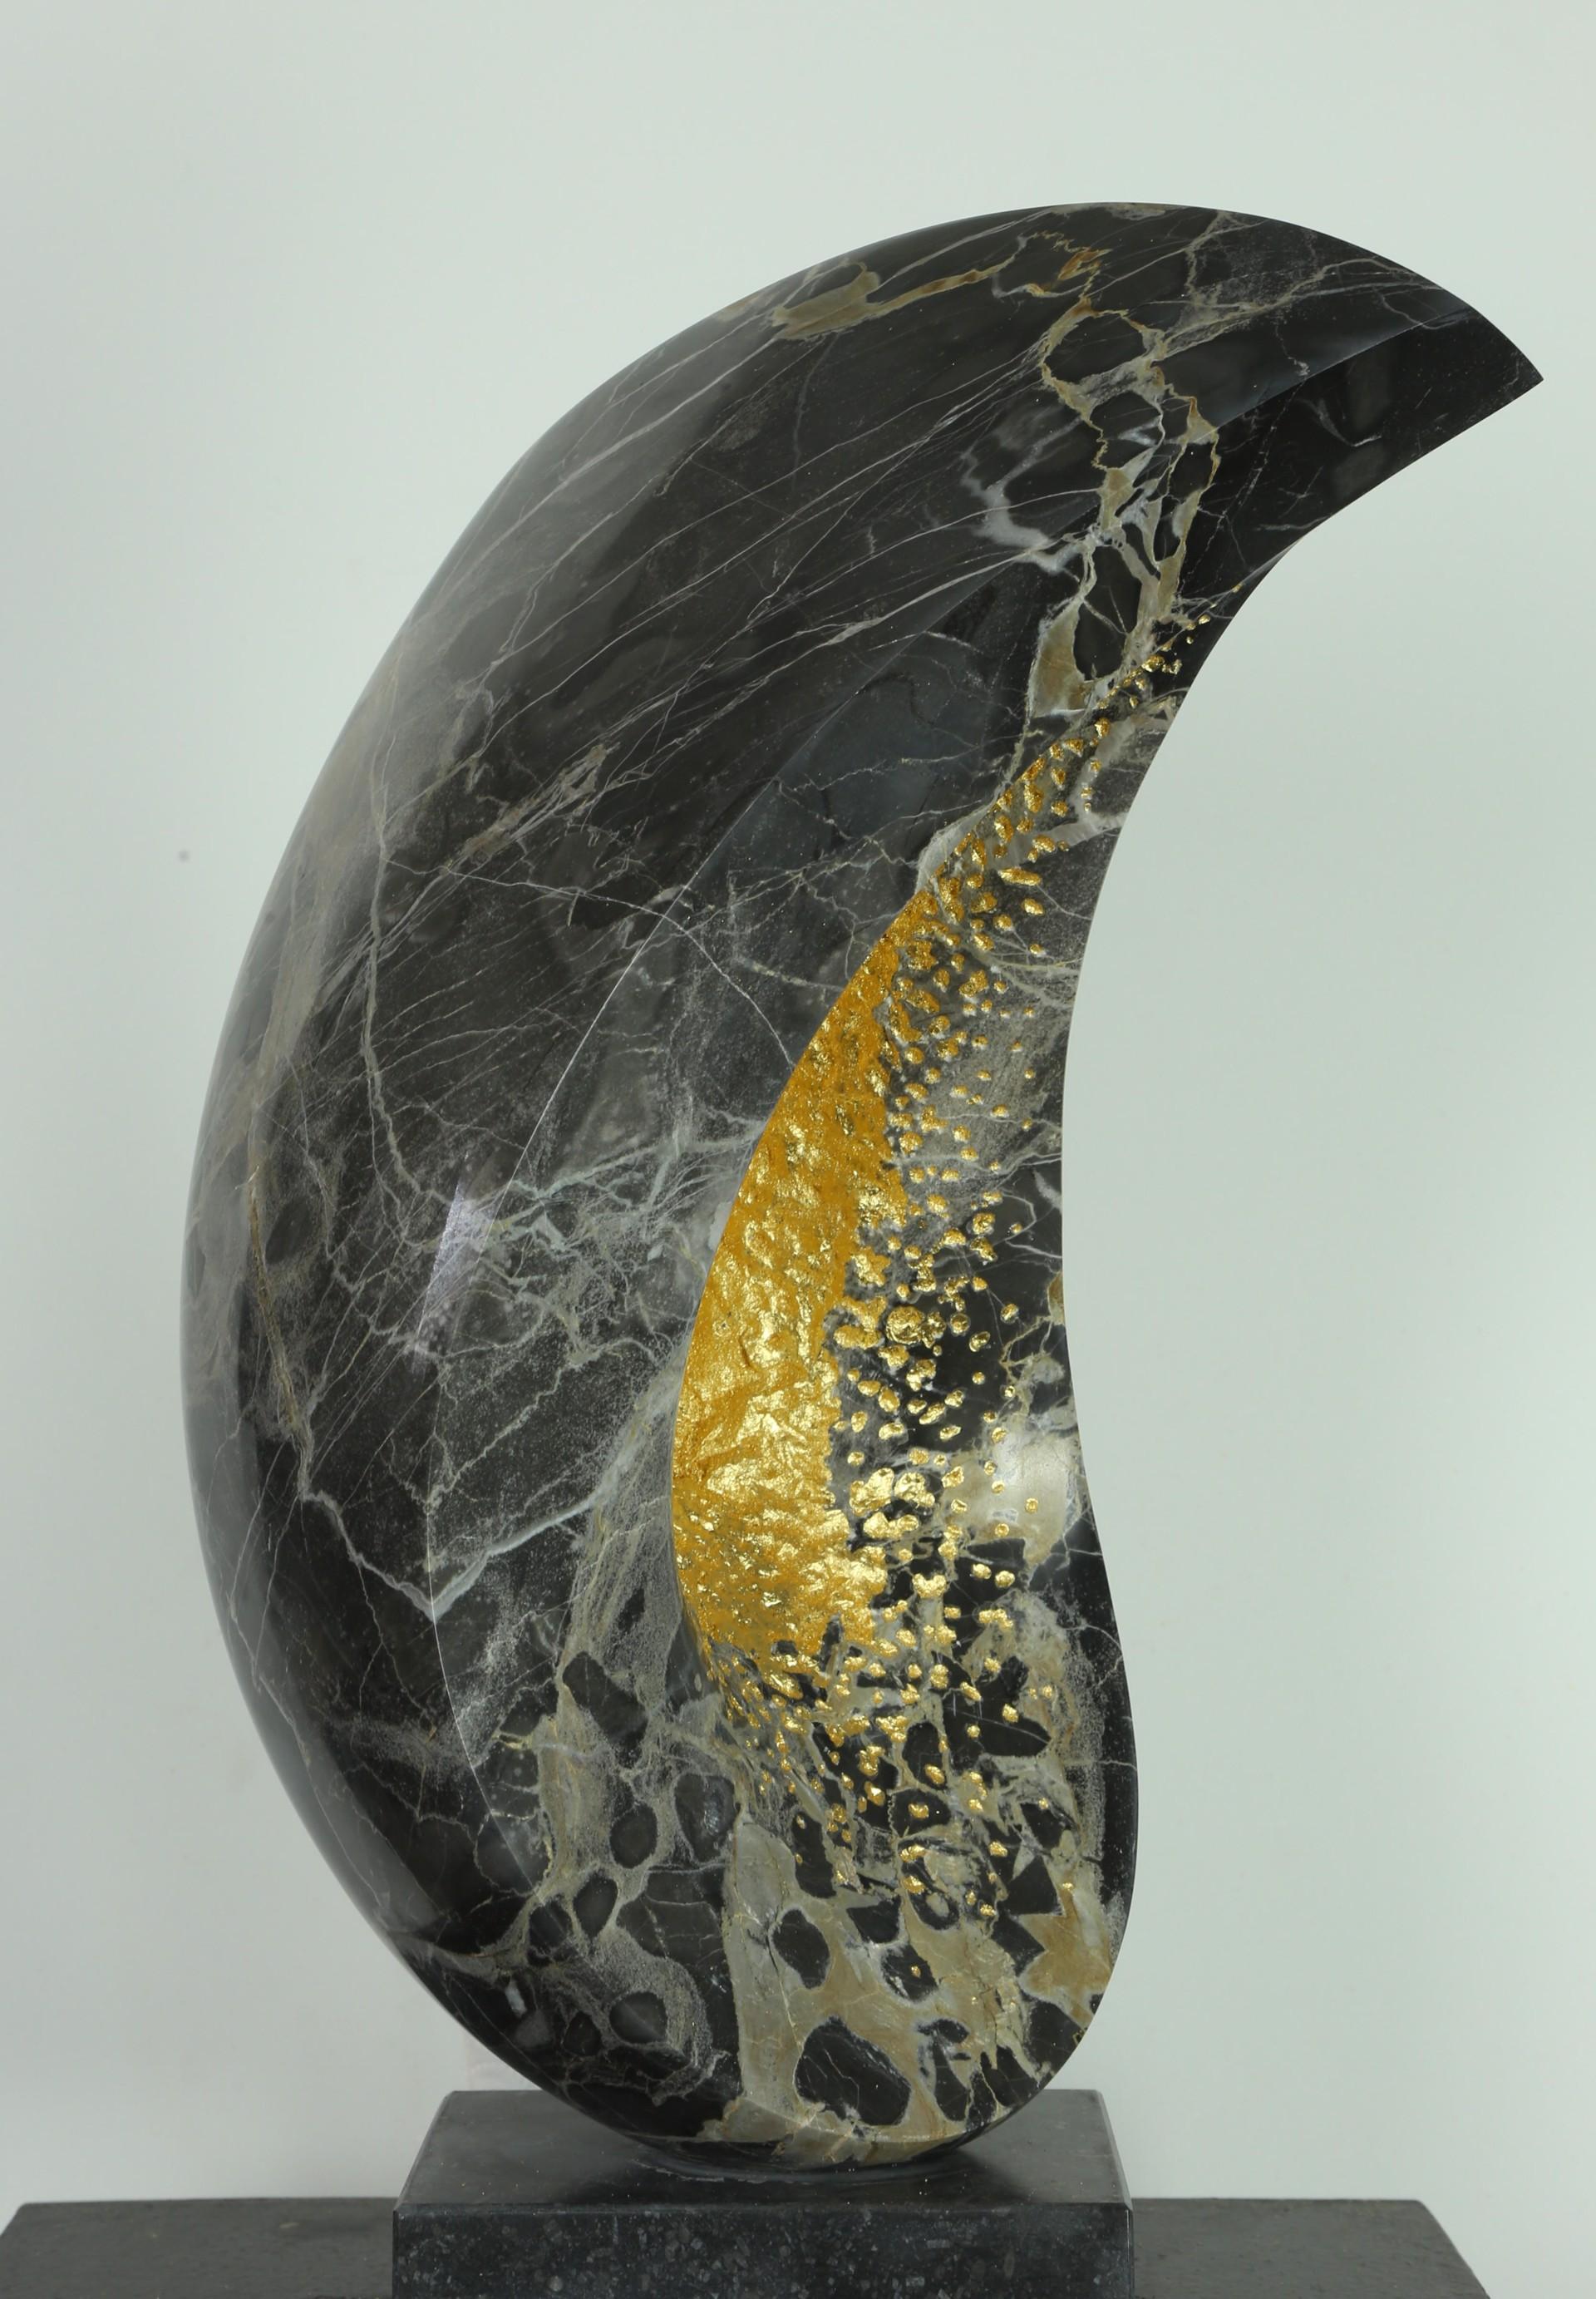 Burnish by Michael Thacker